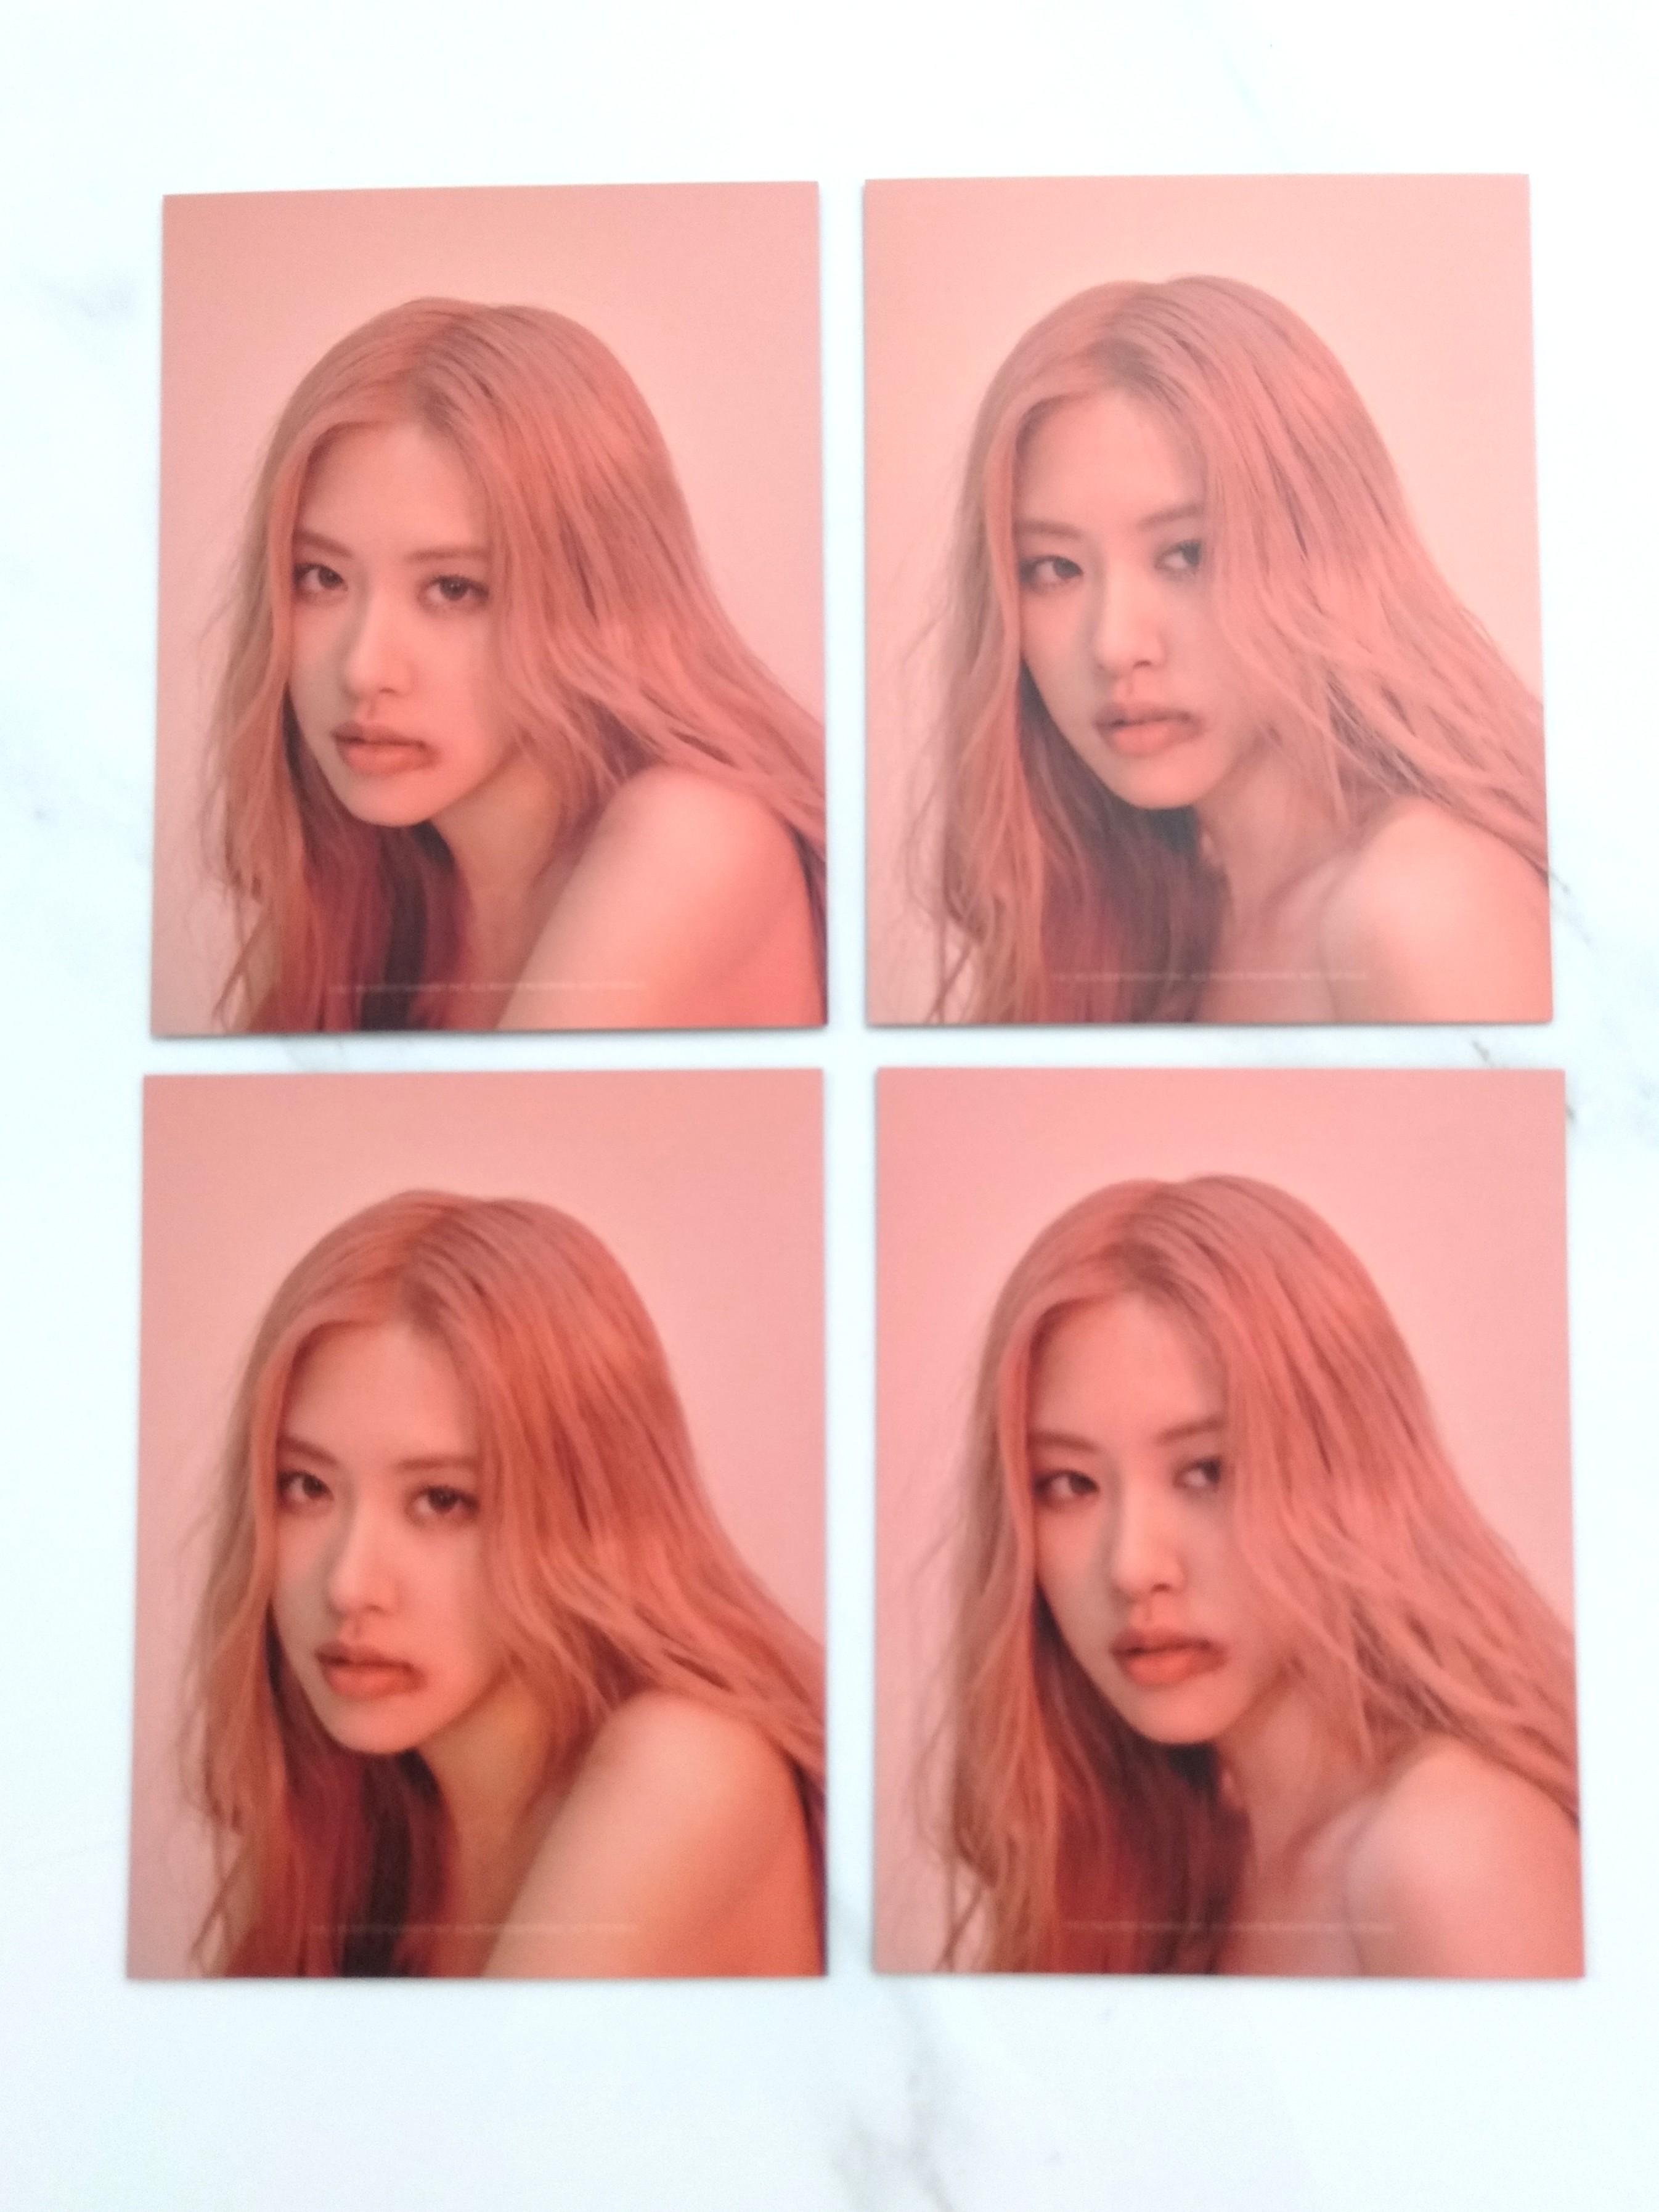 blackpink kill this love rose photocard instock 1556436872 910d27b3